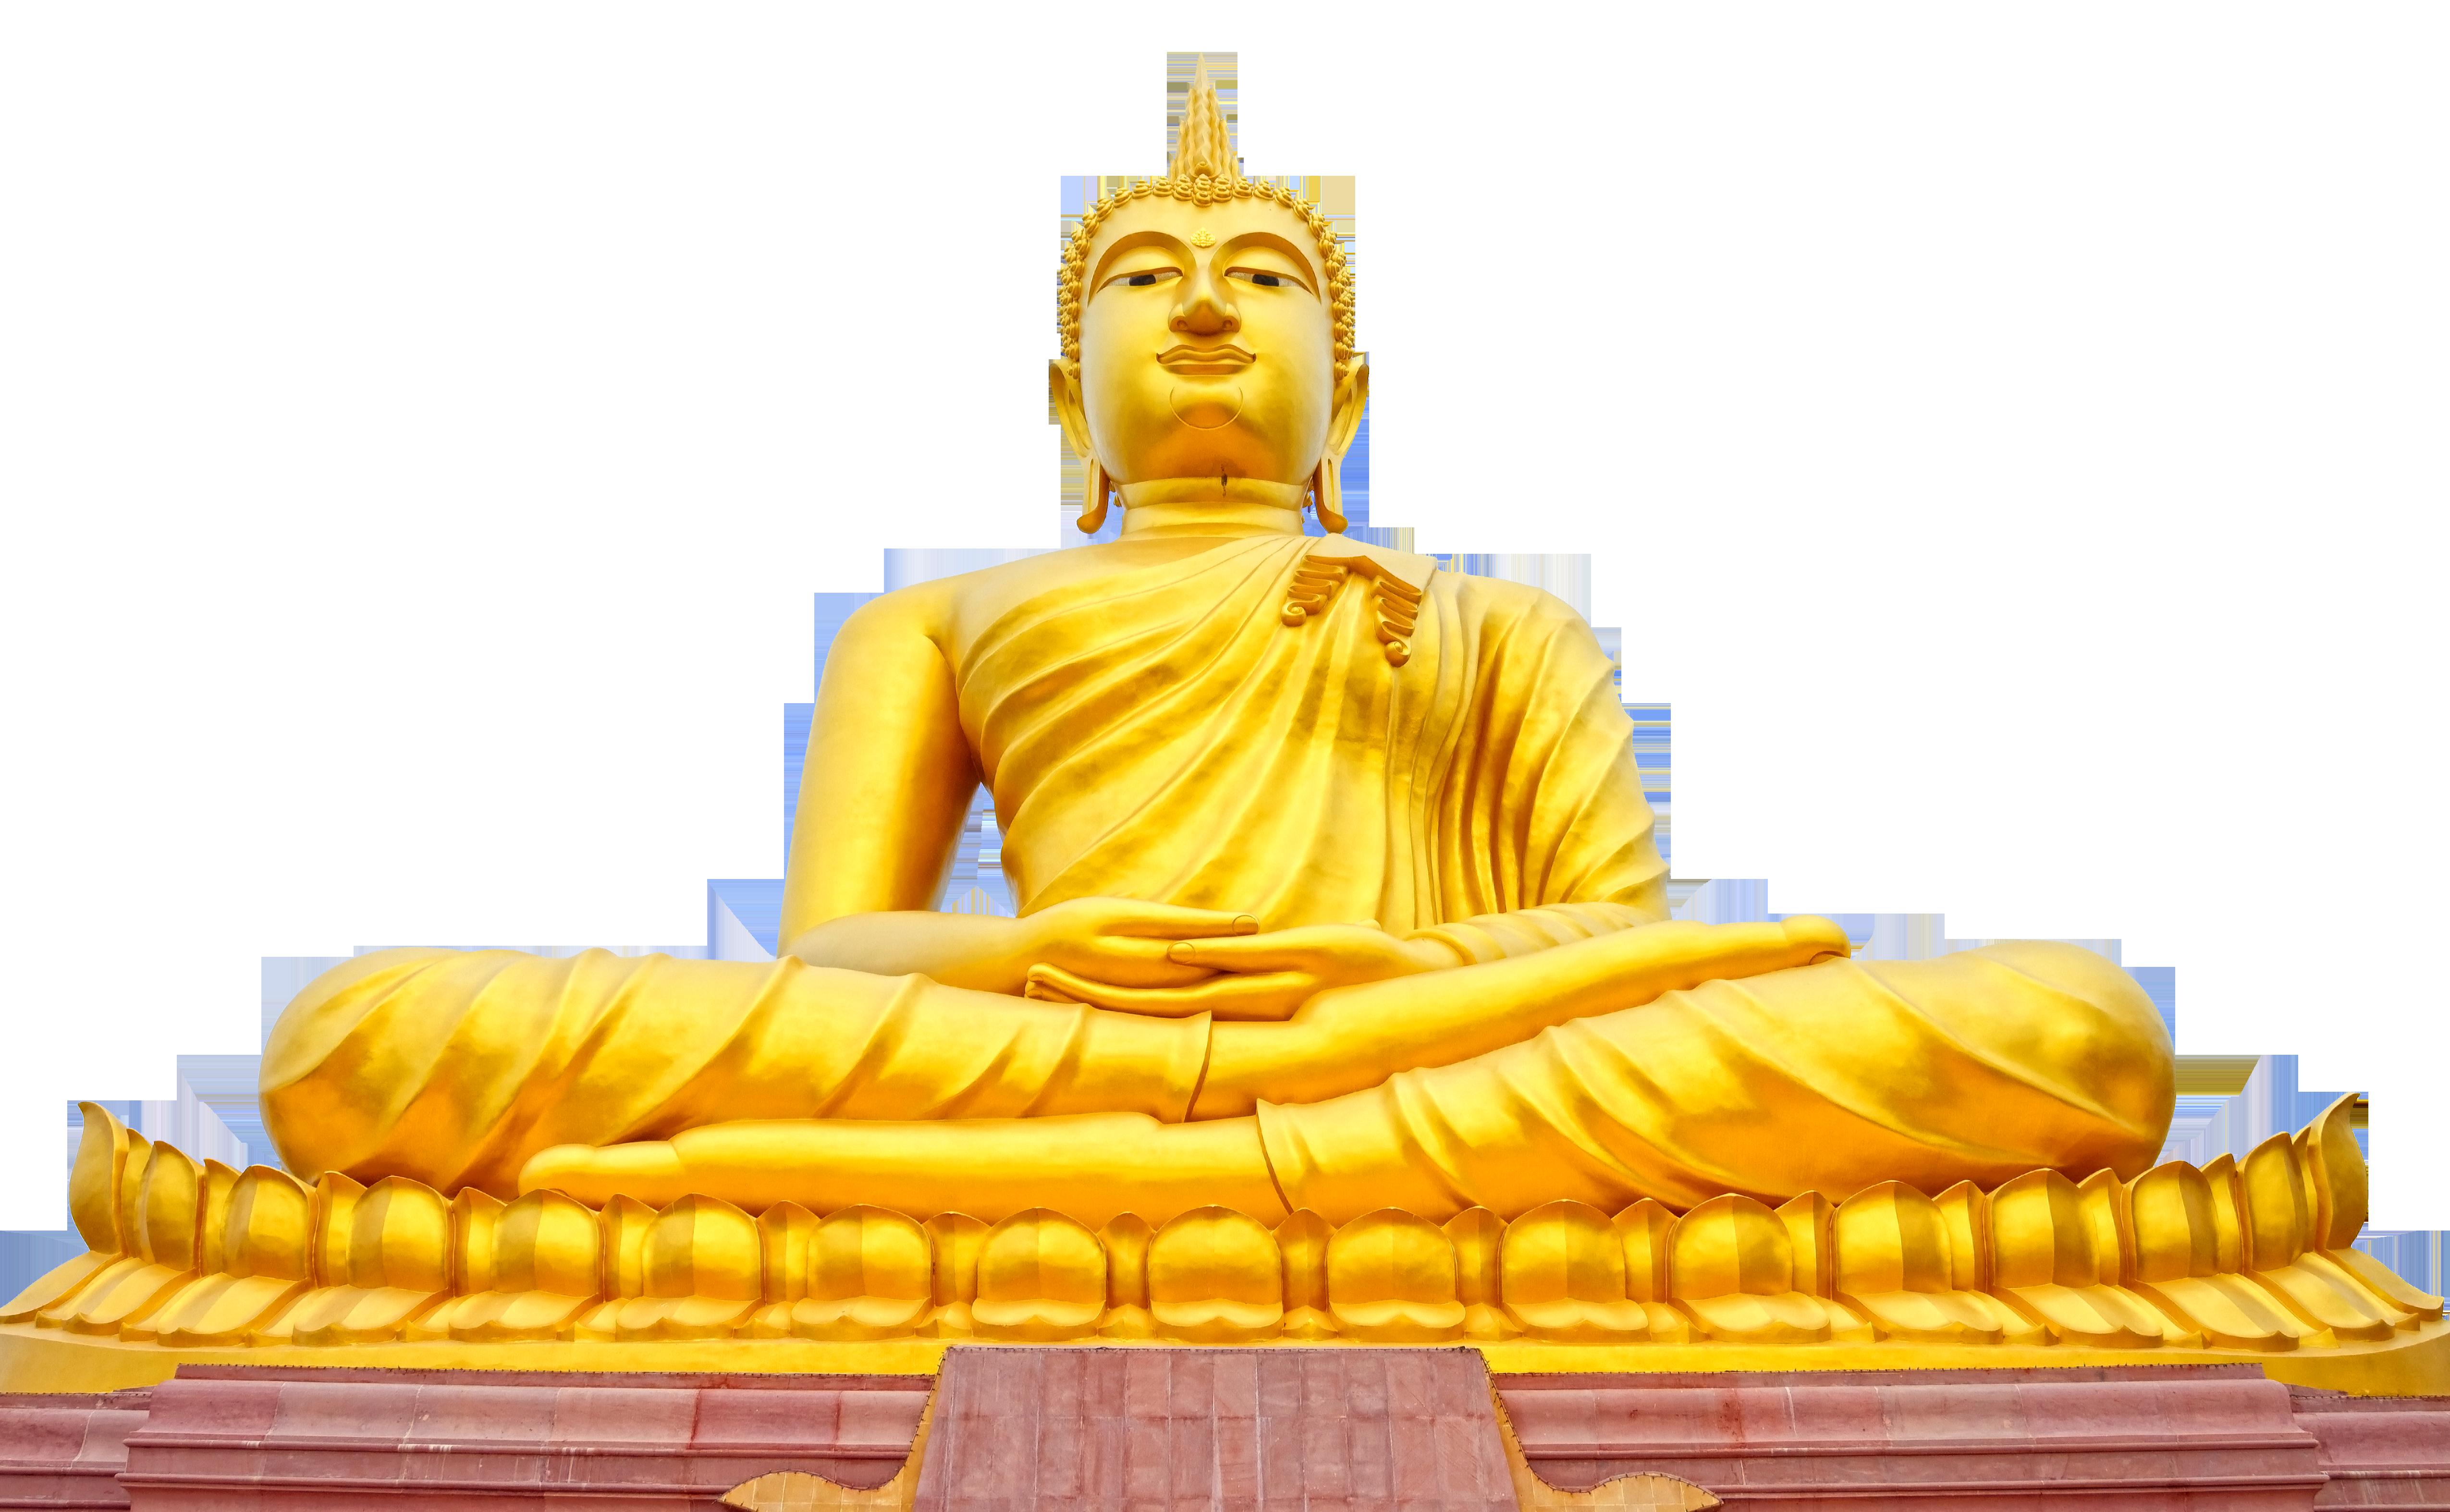 Exceptionnel Png A Di Da Phat Quan The Am Kuanyin Buddha 137 by kwanyinbuddha  XO46